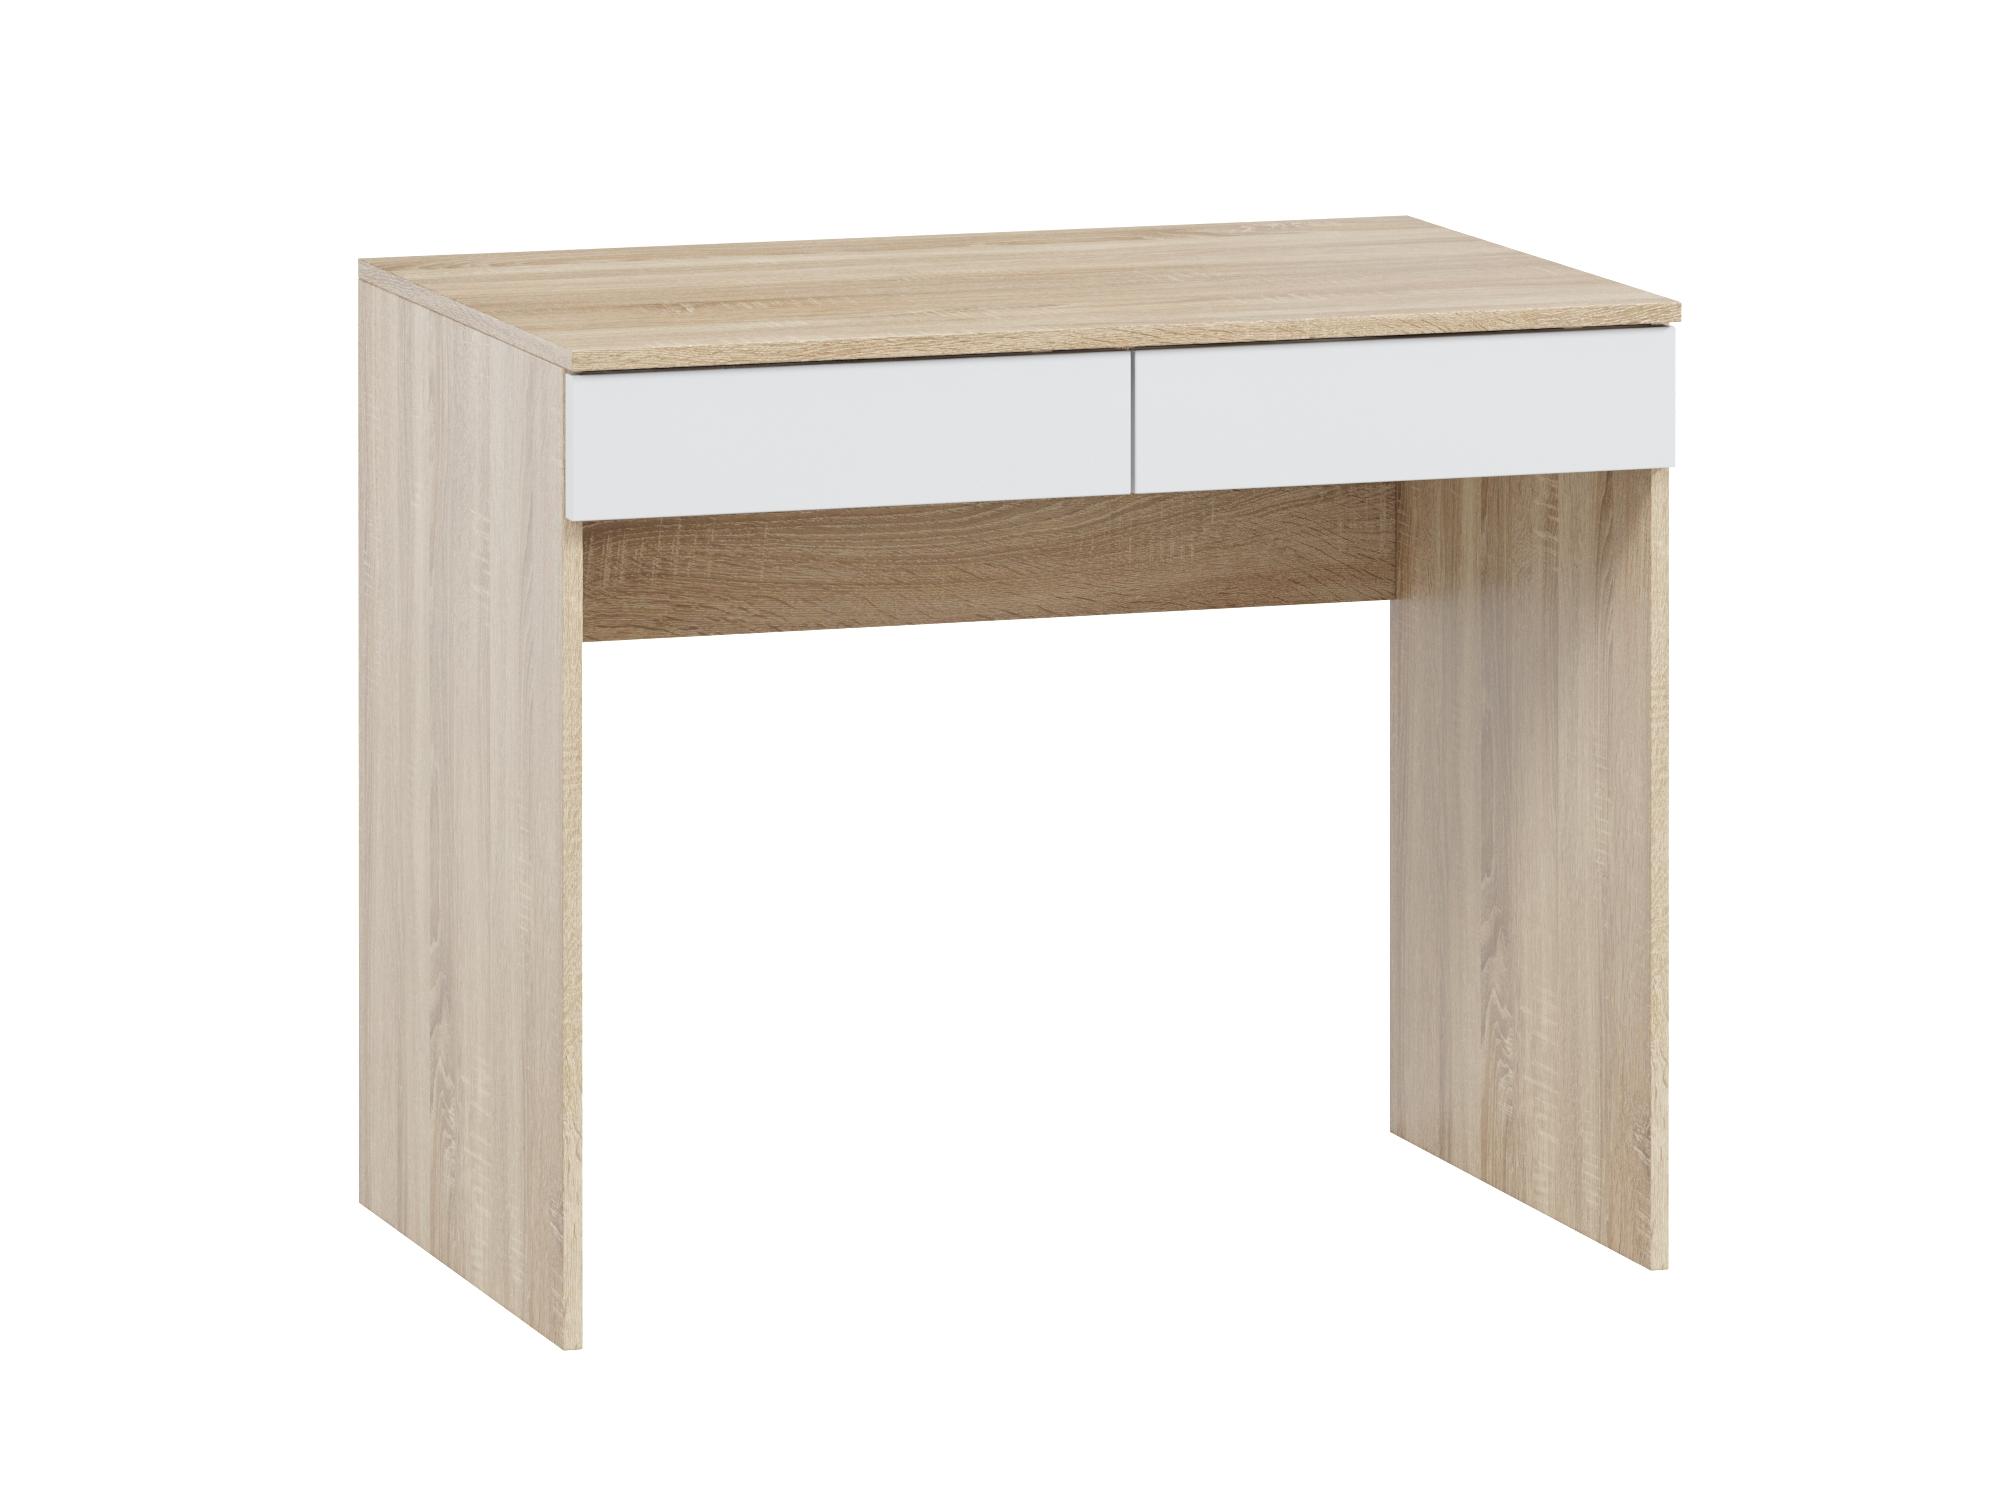 картинка Стол Дантон 3 от магазина Woodcraft